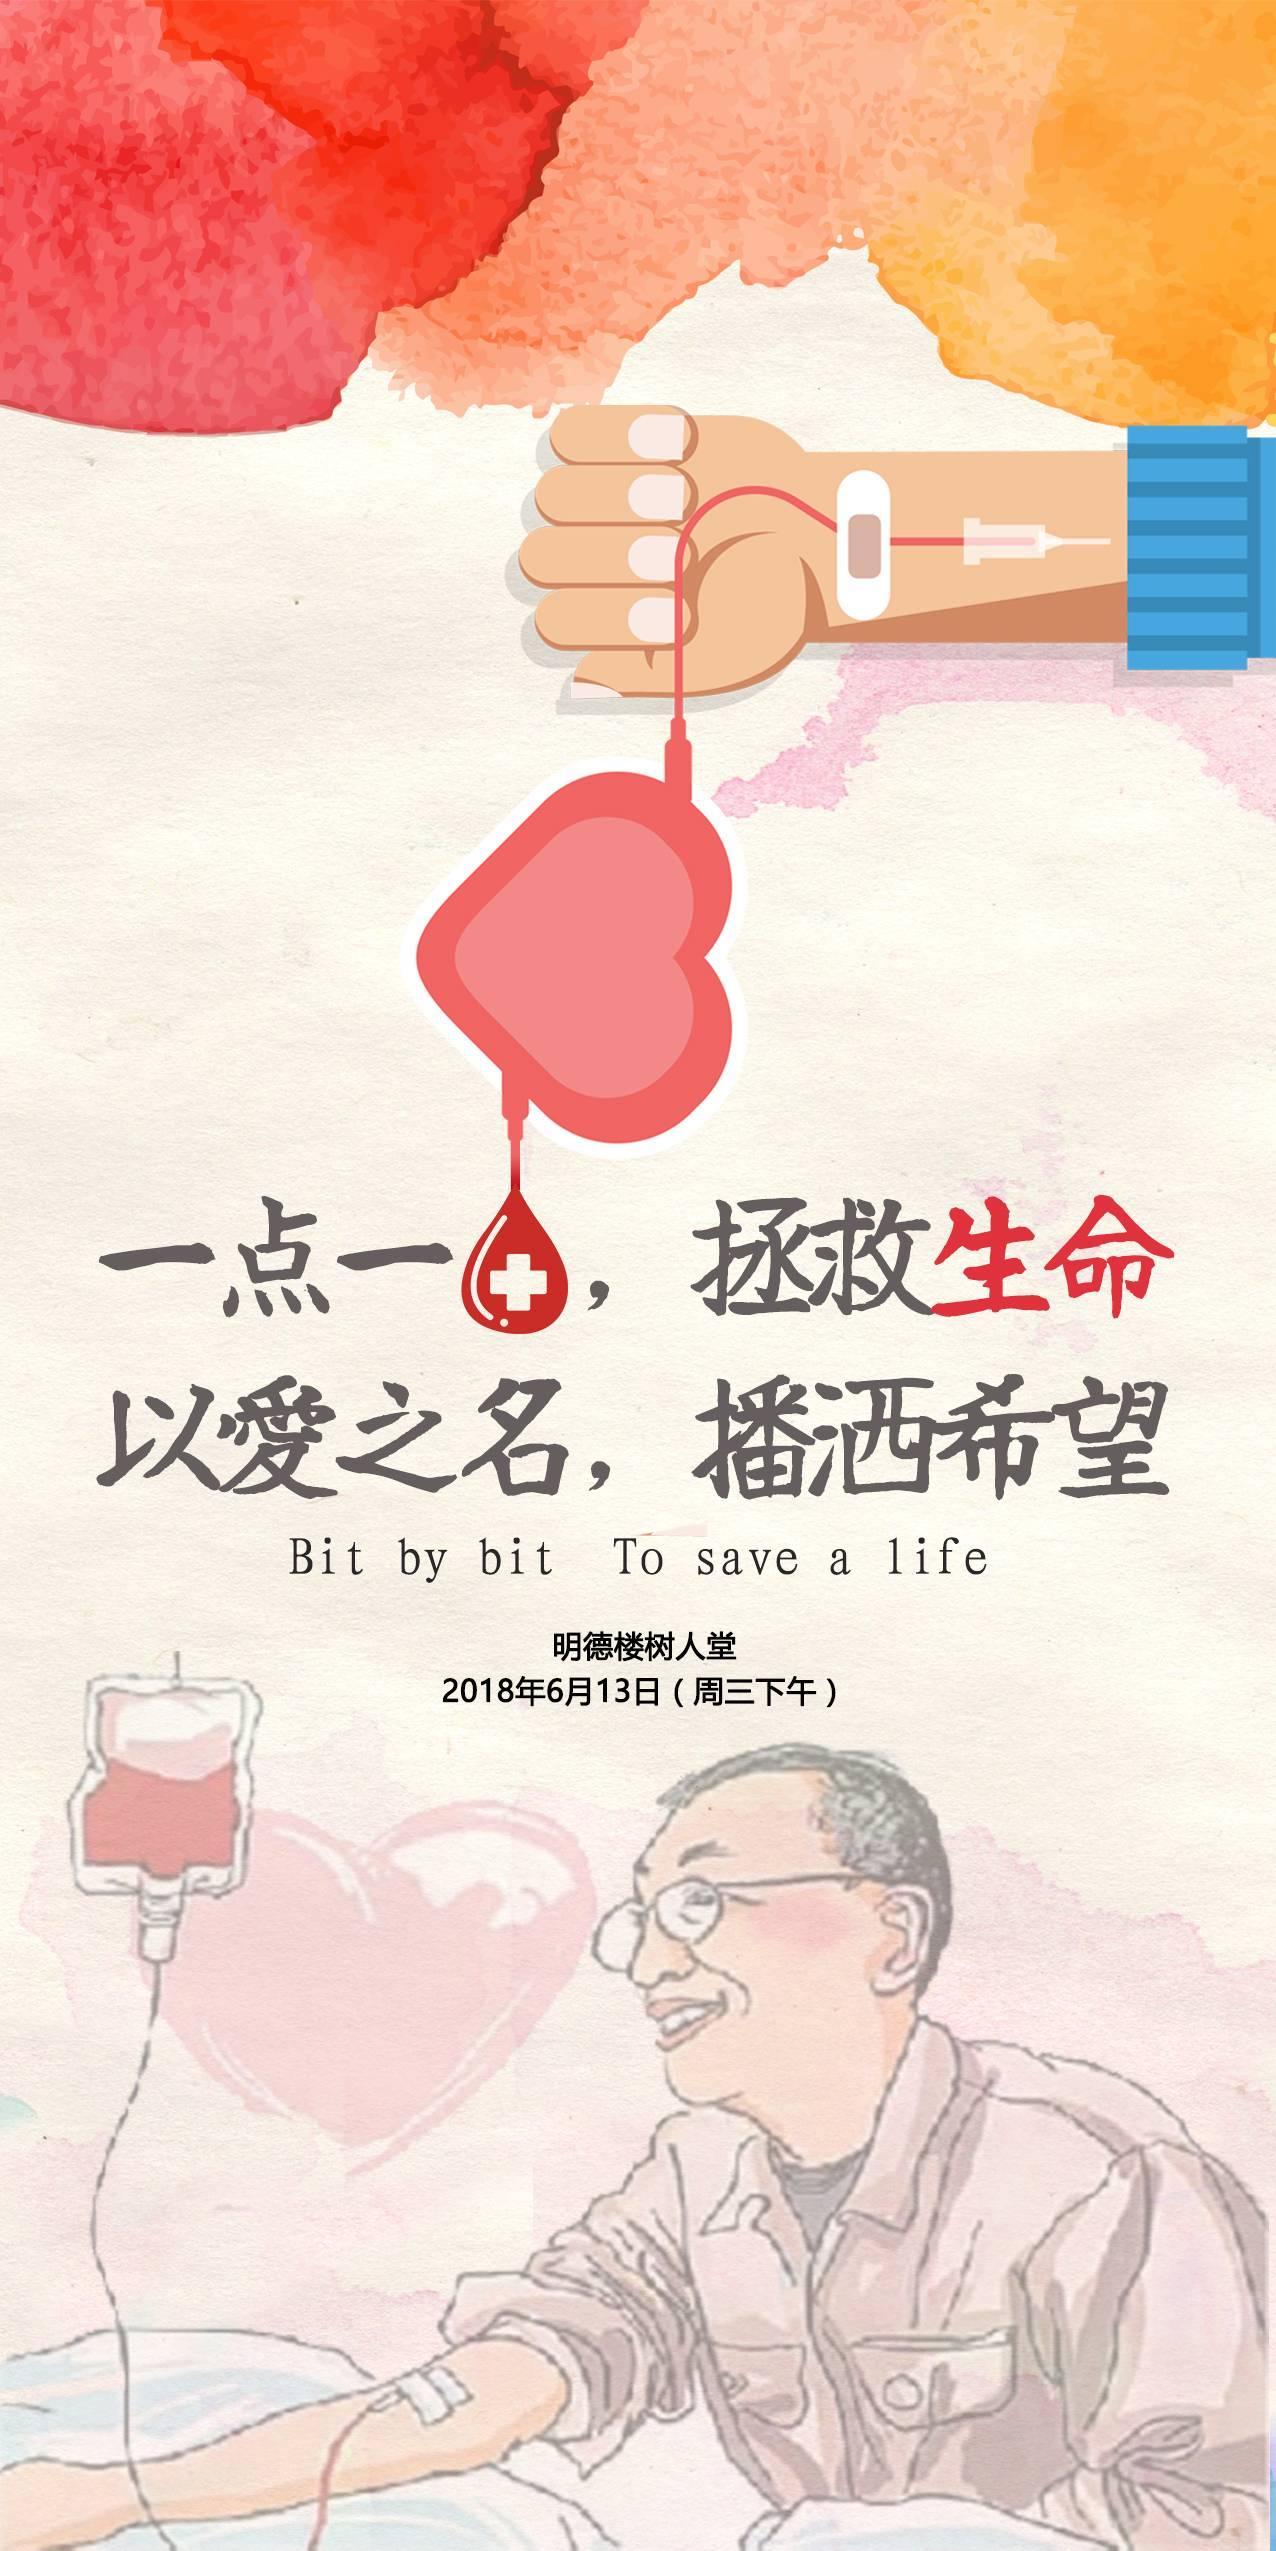 Photoshop:6.14世界献血海报设计分享poster design(内附psd) PS教程 第1张